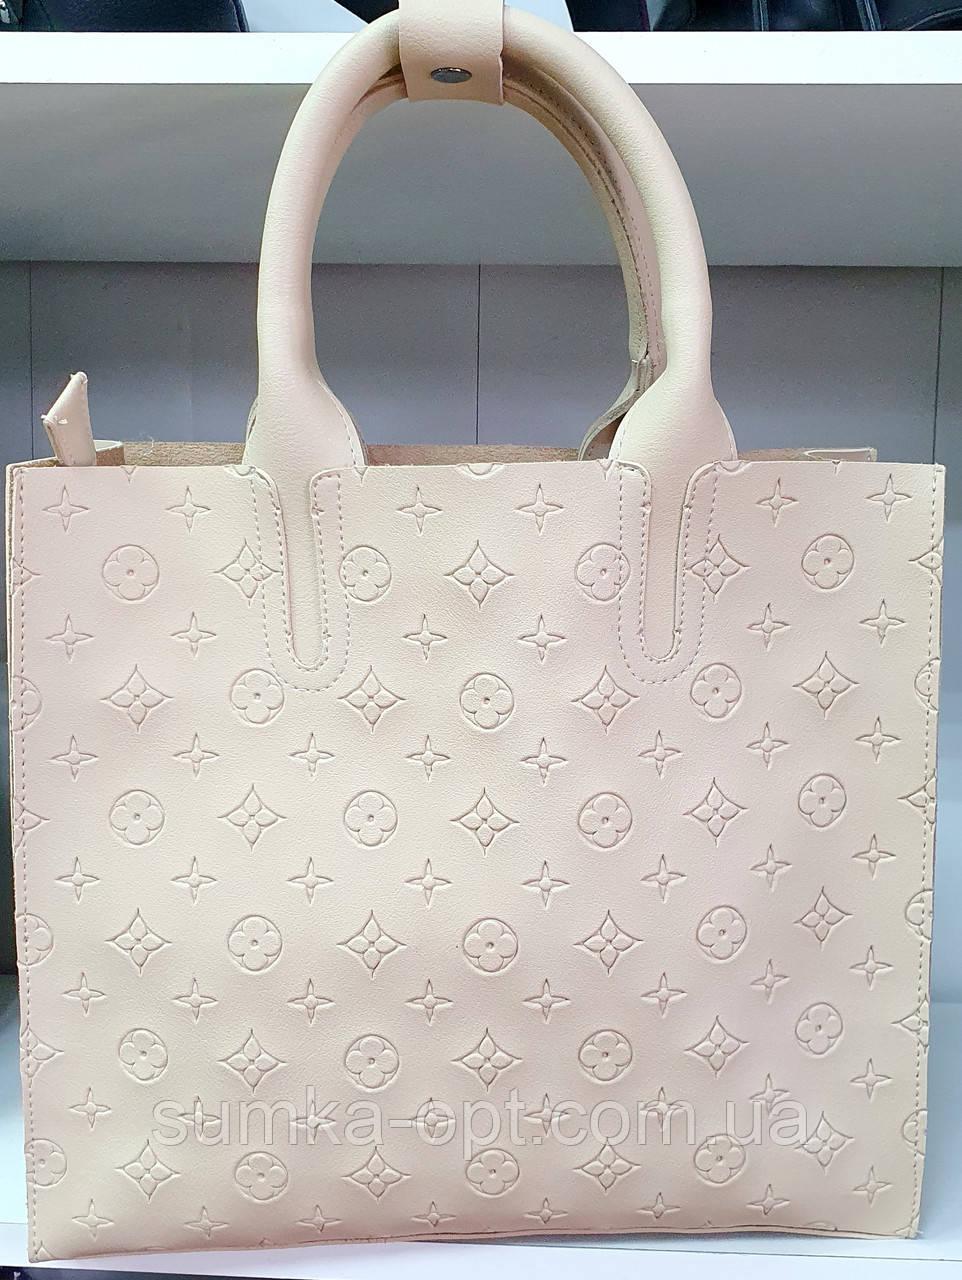 Брендовая женская сумка Louis Vitton 32*28 см, молочная